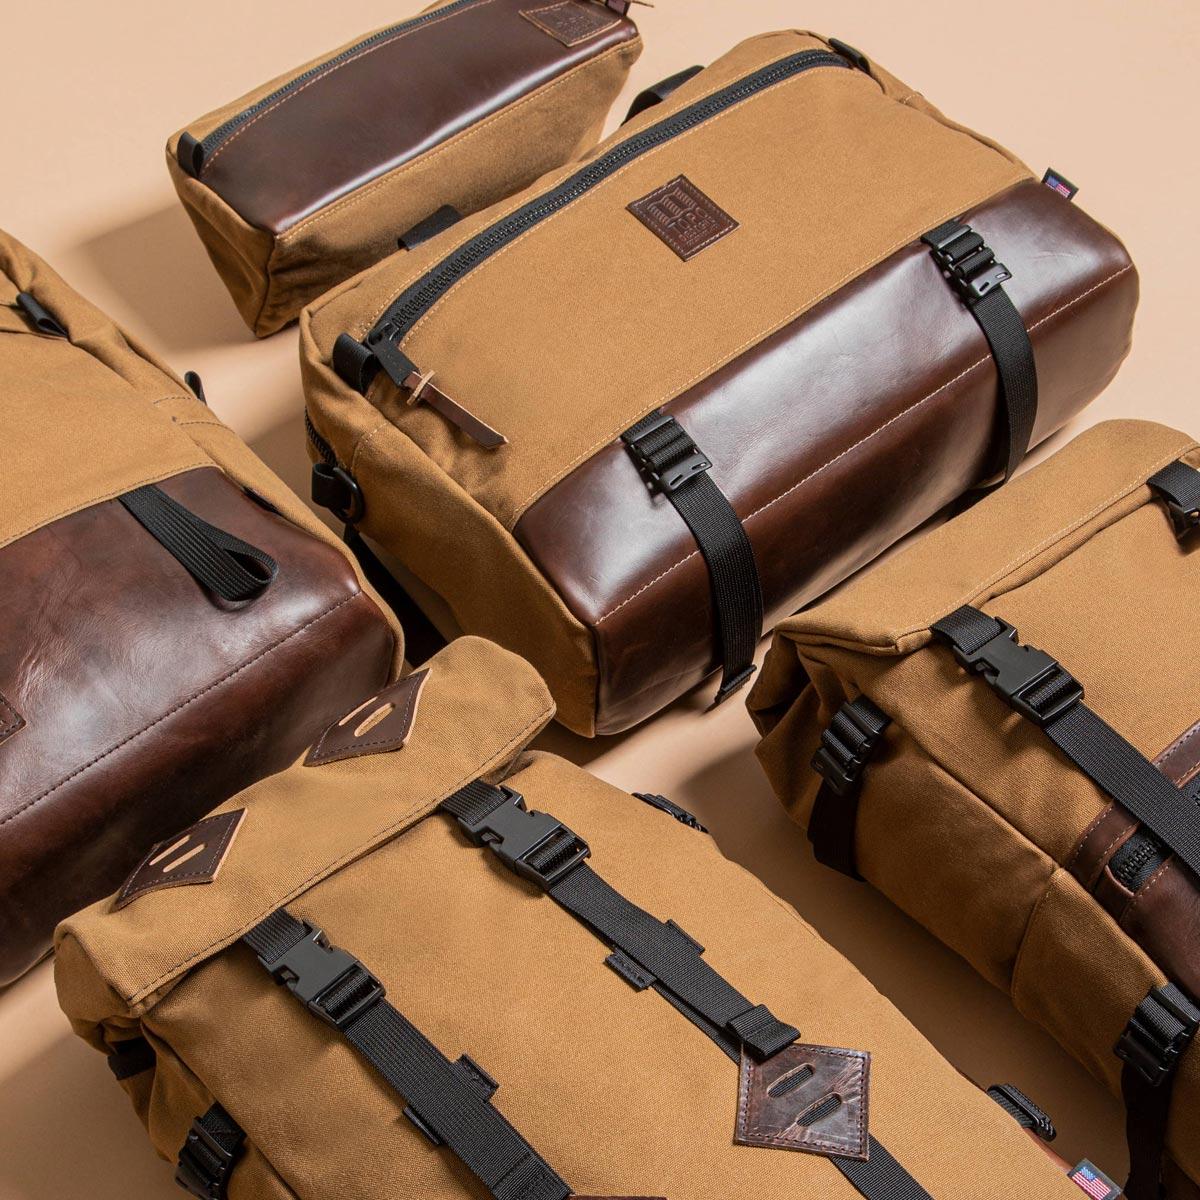 Topo Designs Commuter Briefcase Heritage Dark Khaki Canvas/Dark Brown Leather, briefcase, shoulder bag and backpack